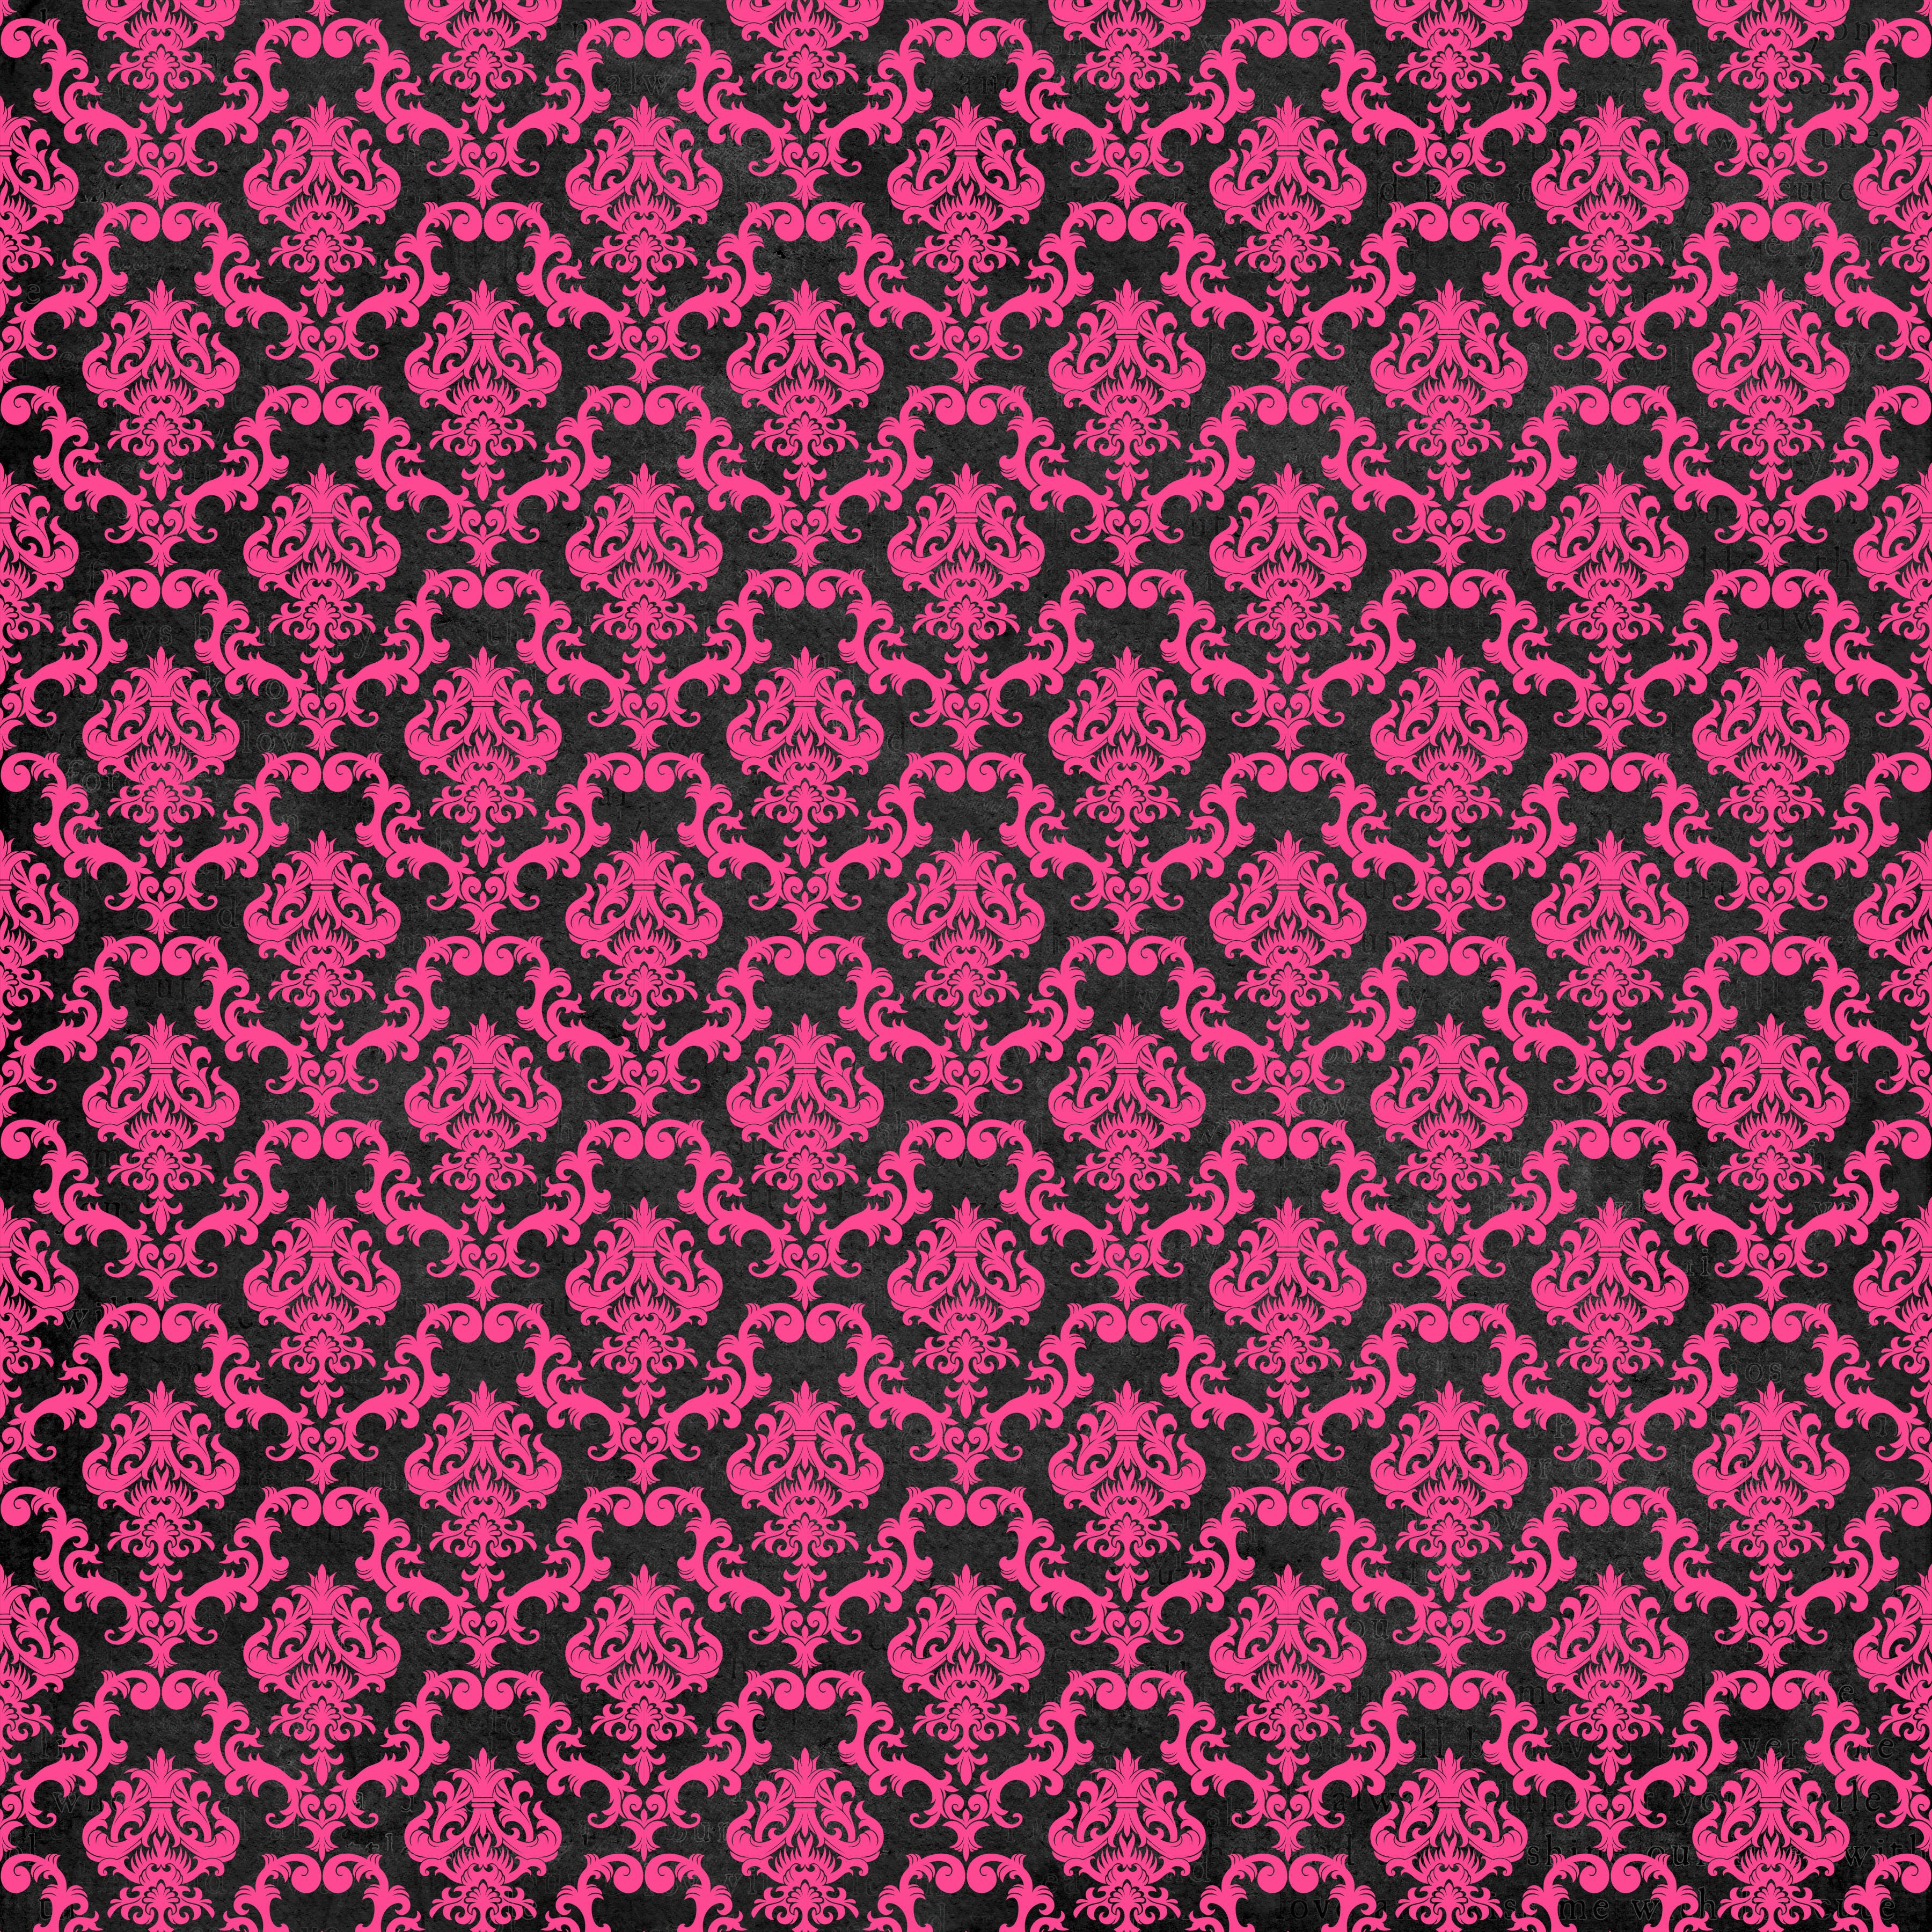 Wallpaper Black Pink: Pink And Black Damask Wallpaper